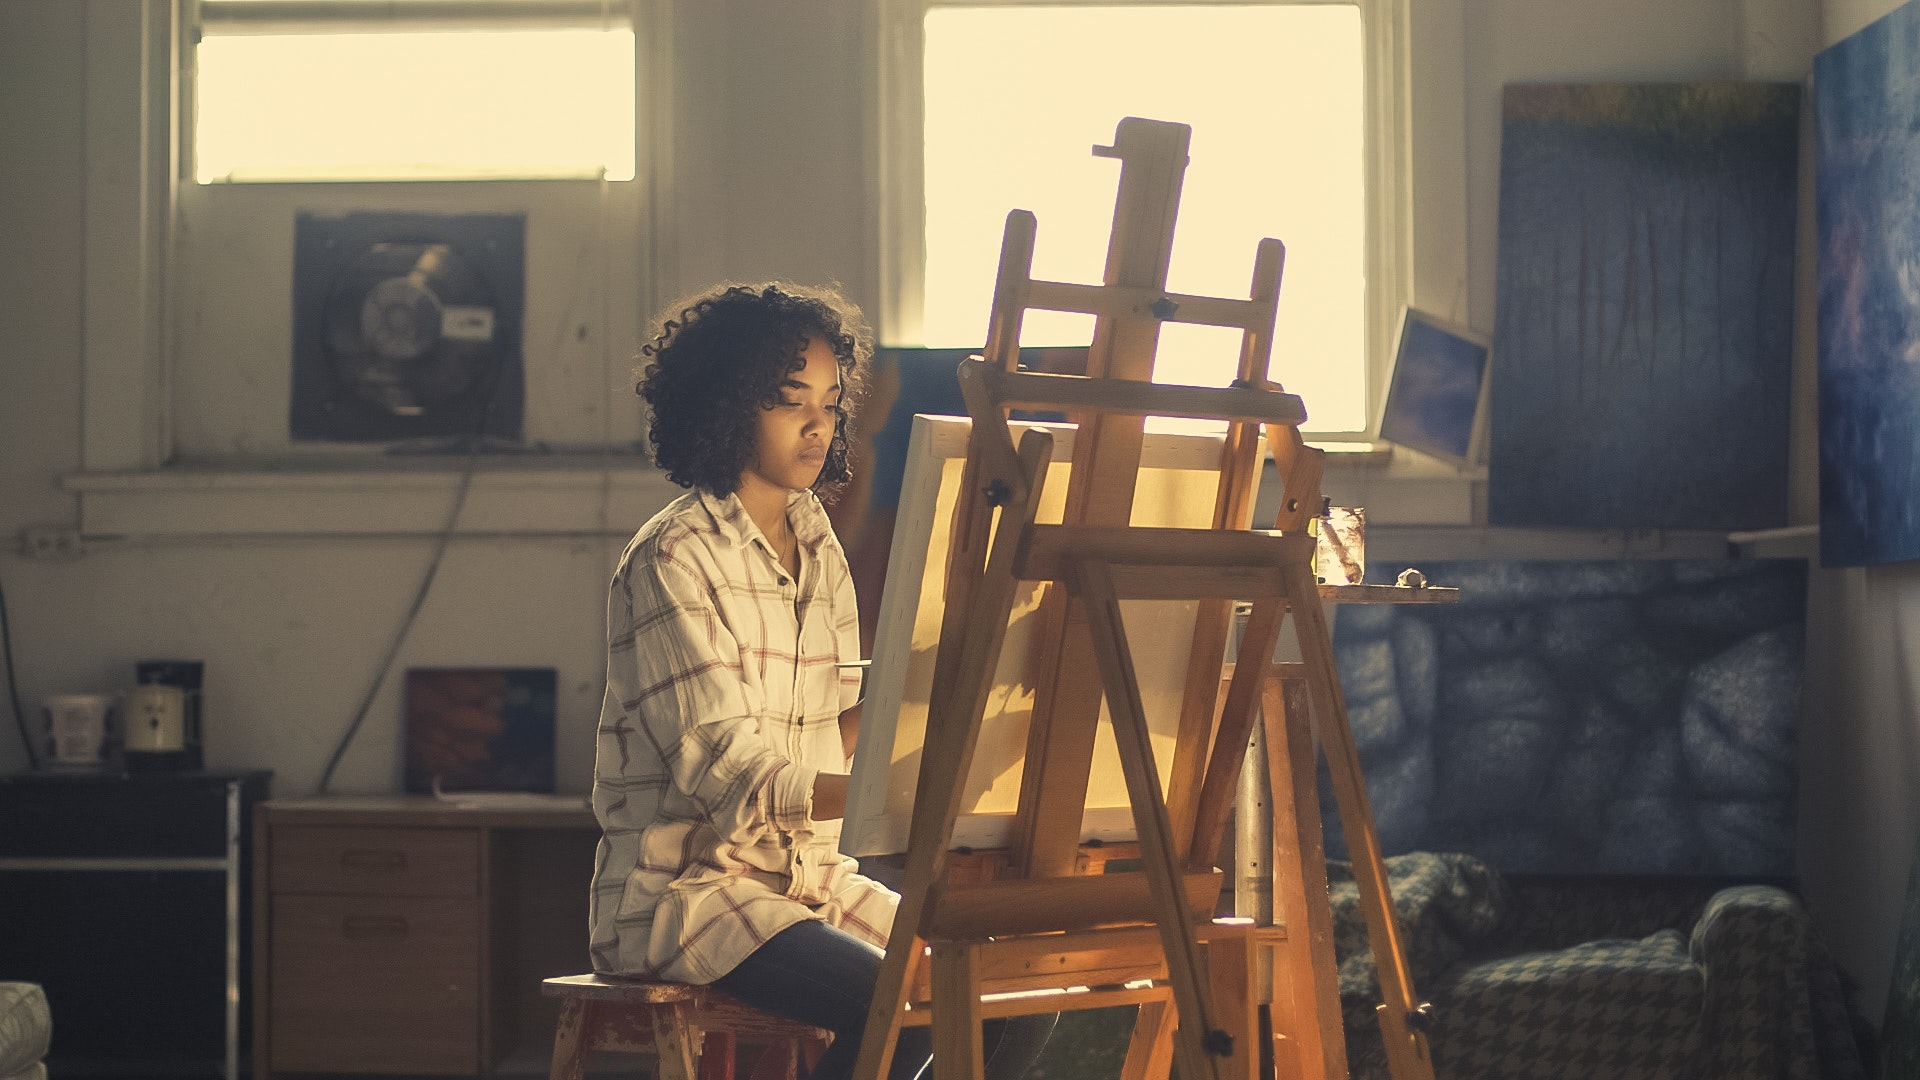 adult-art-chair-374068.jpg